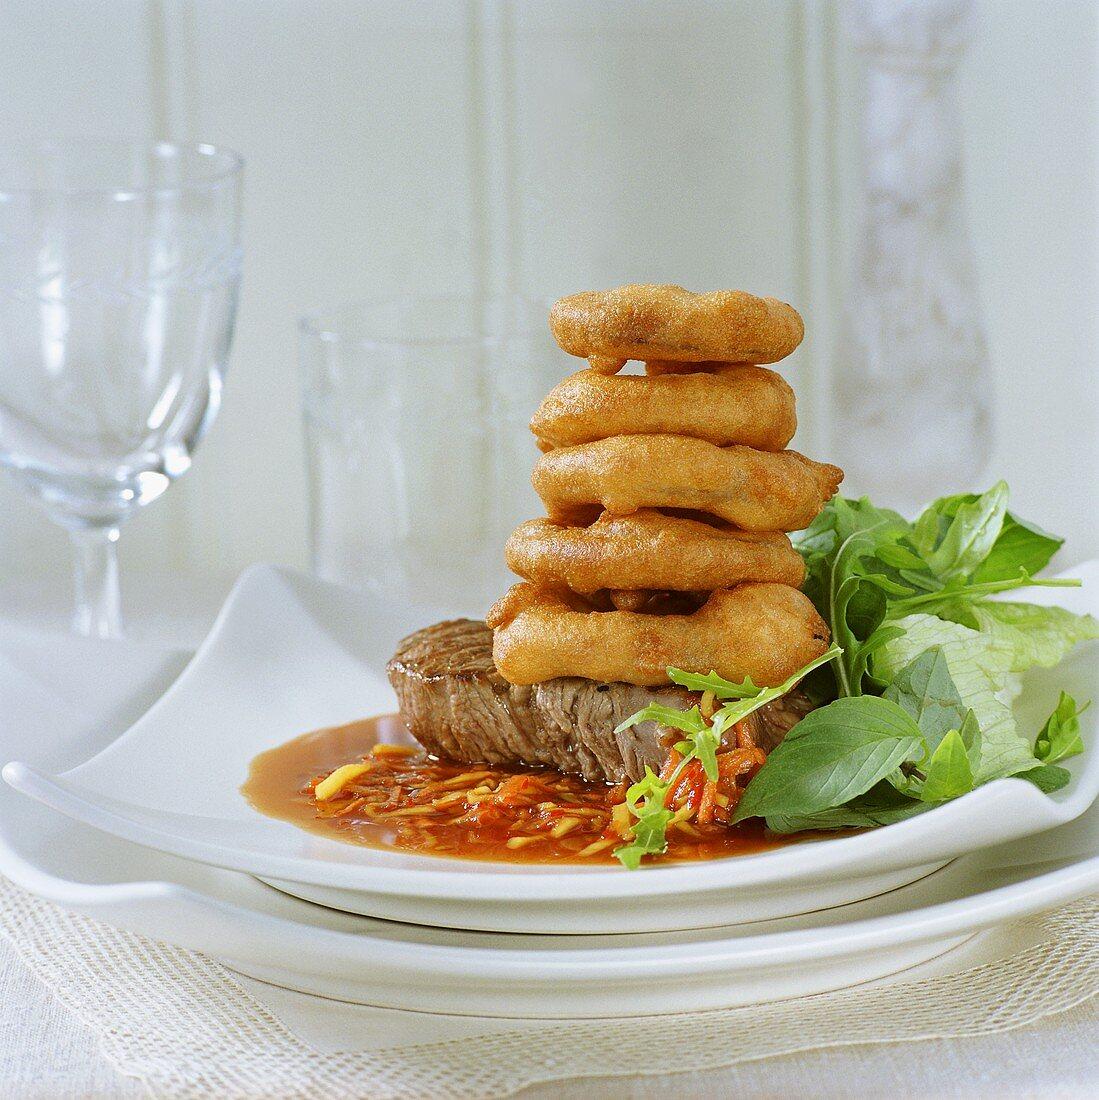 Steak with deep-fried onion rings